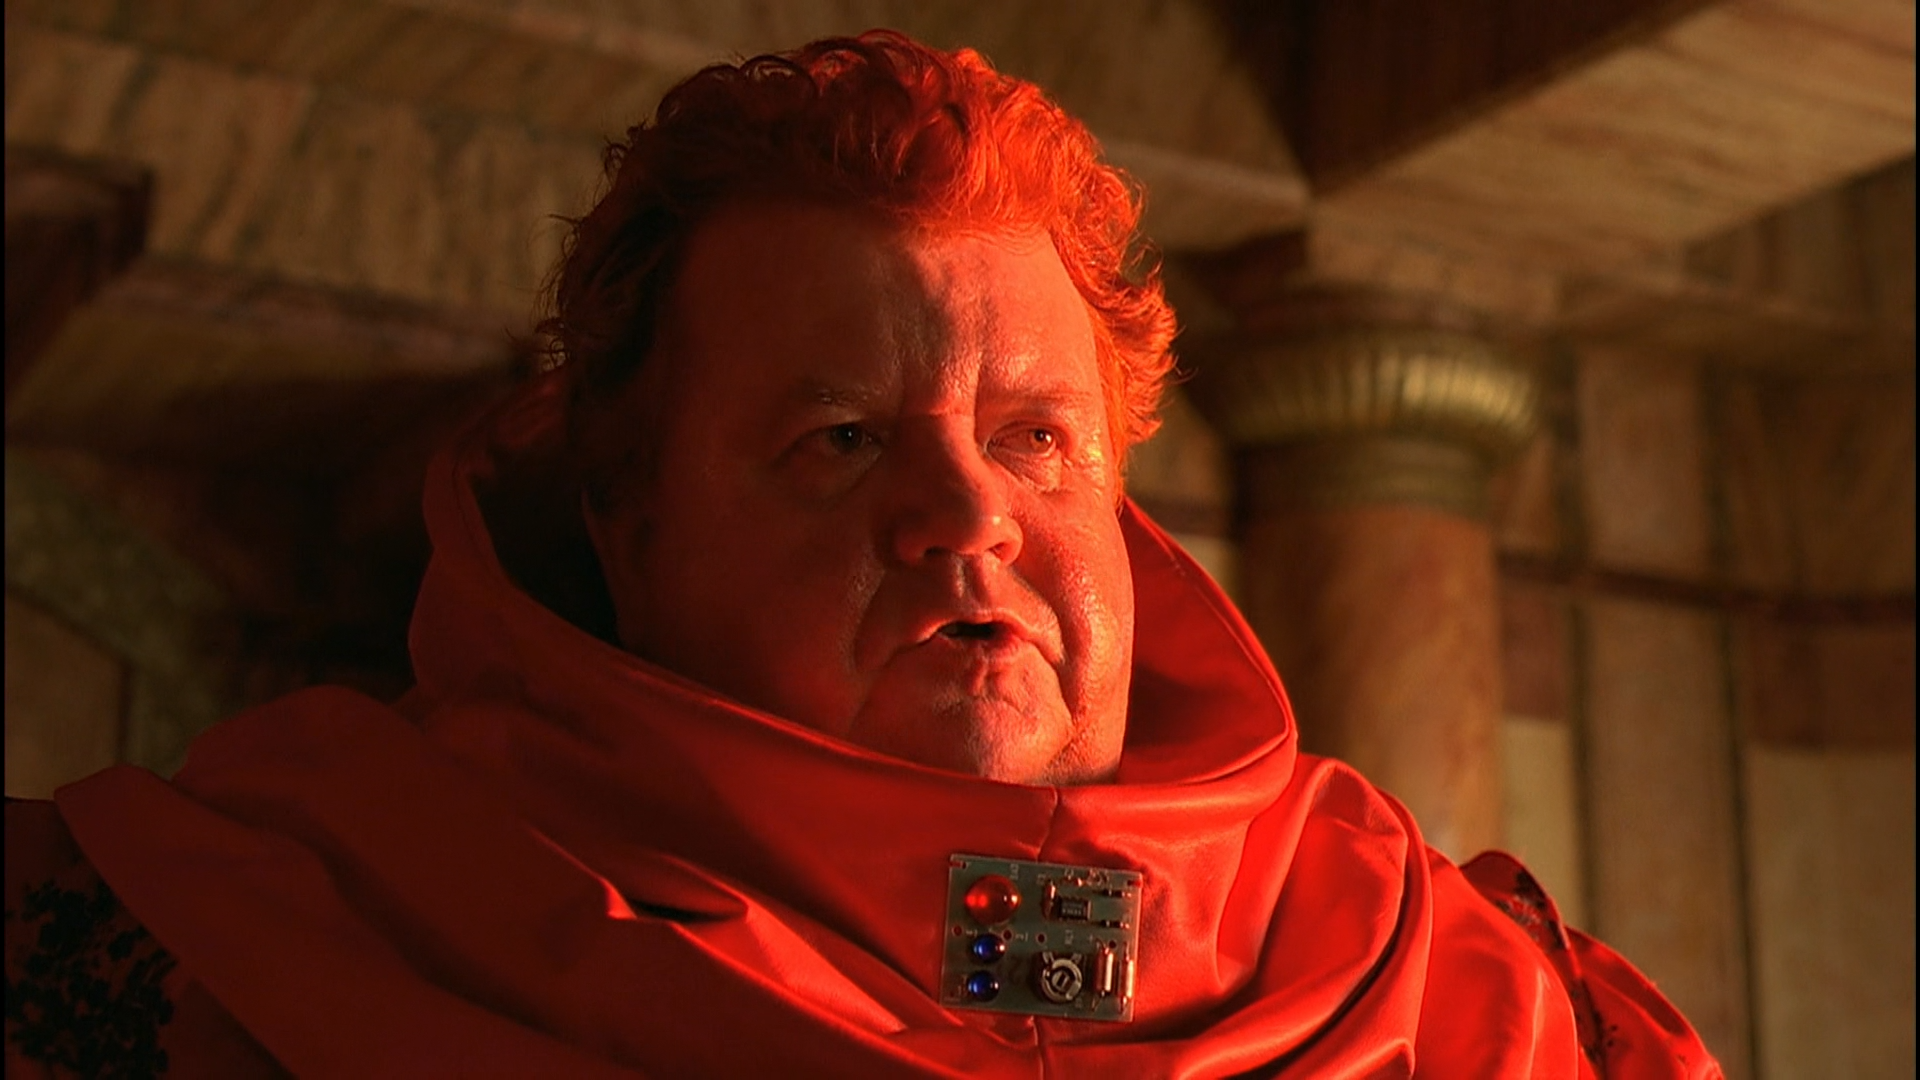 Frank-Herbert-Dune-Ian-McNiece-as-Baron-Harkonnen